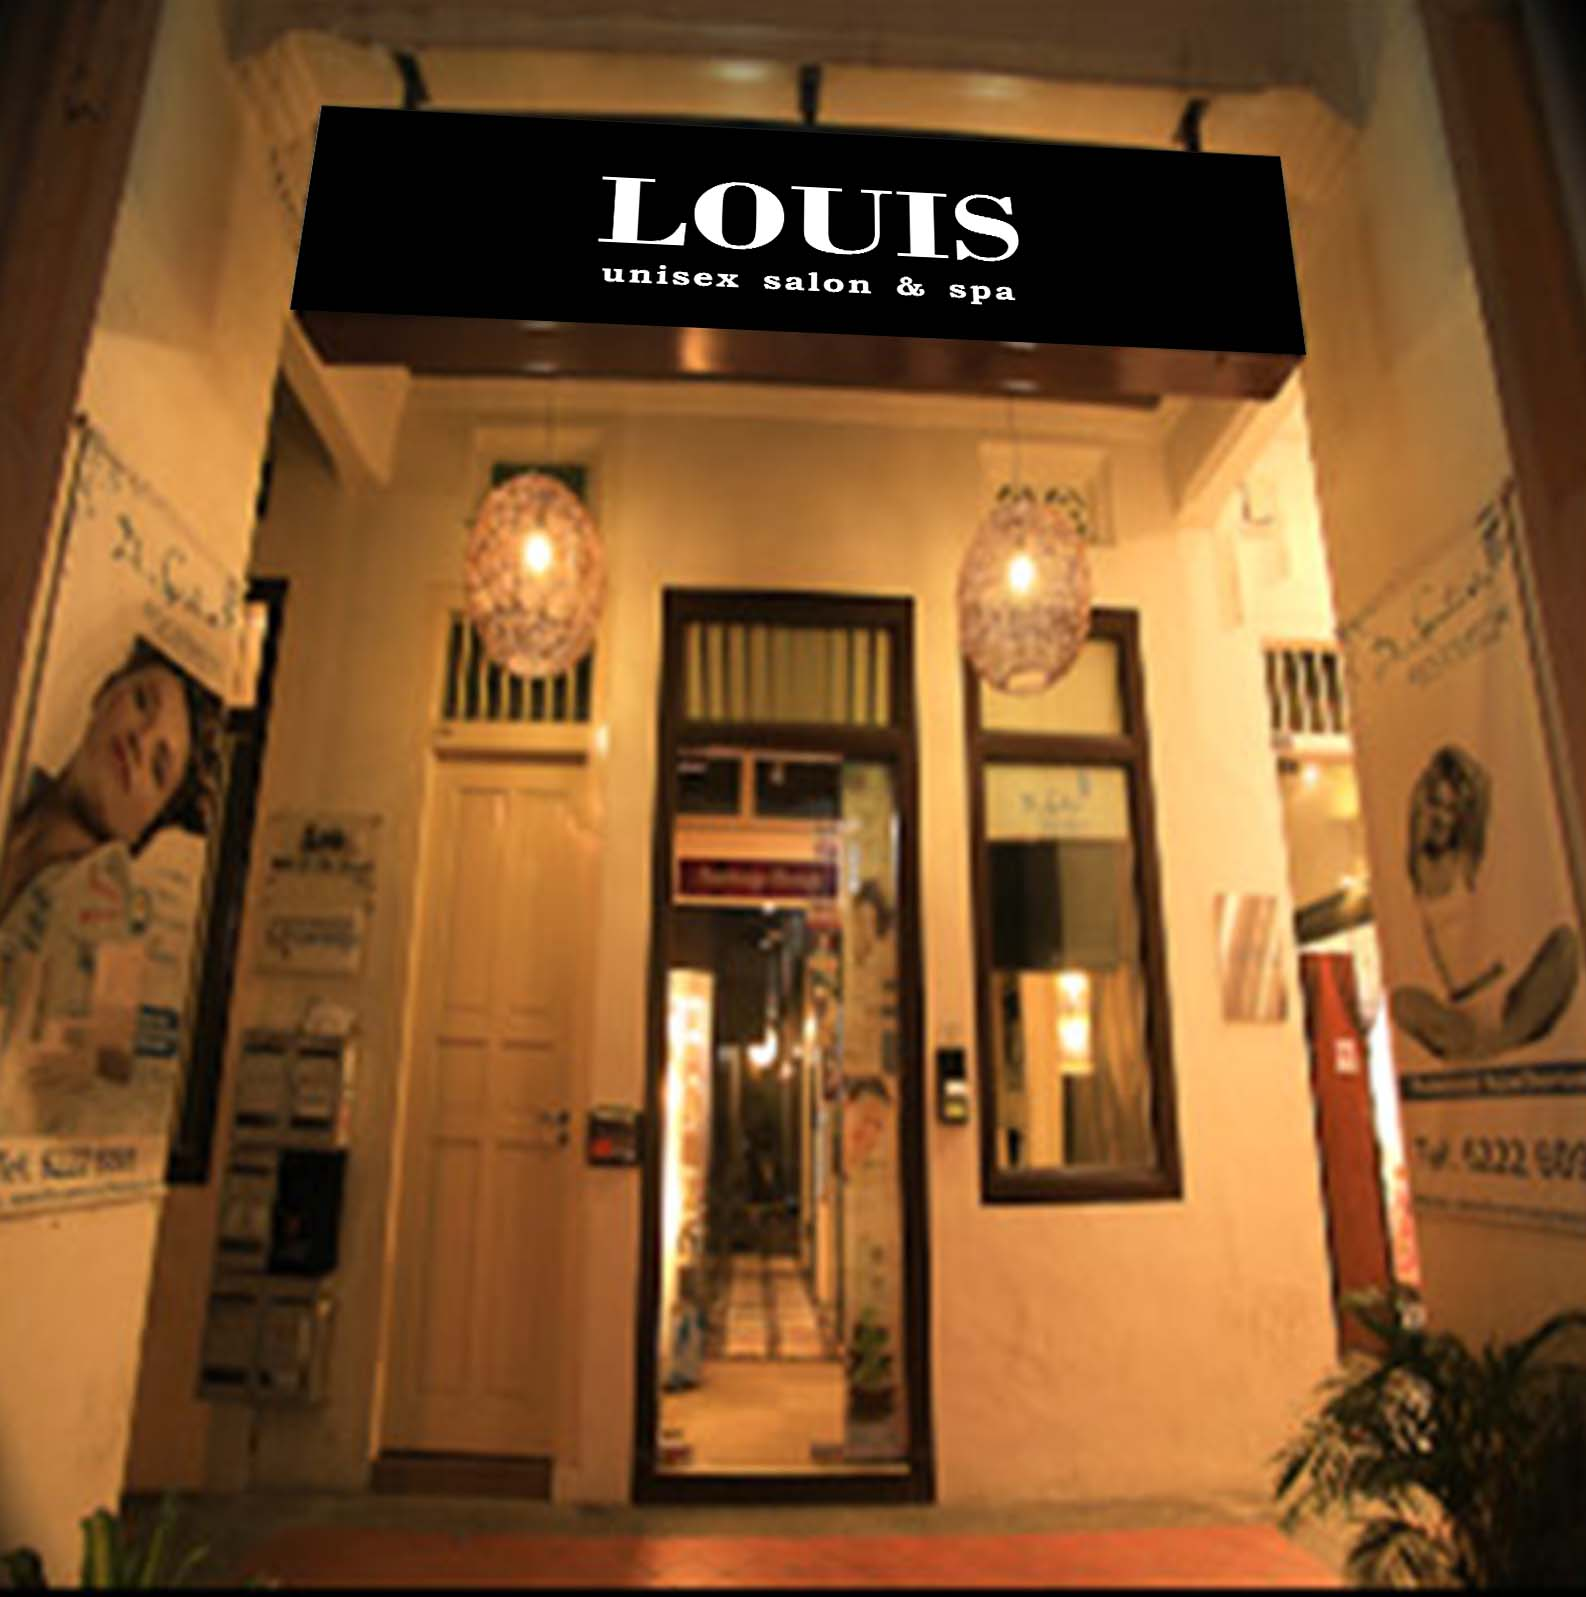 louis+unisex+salon+dubai30 (35)